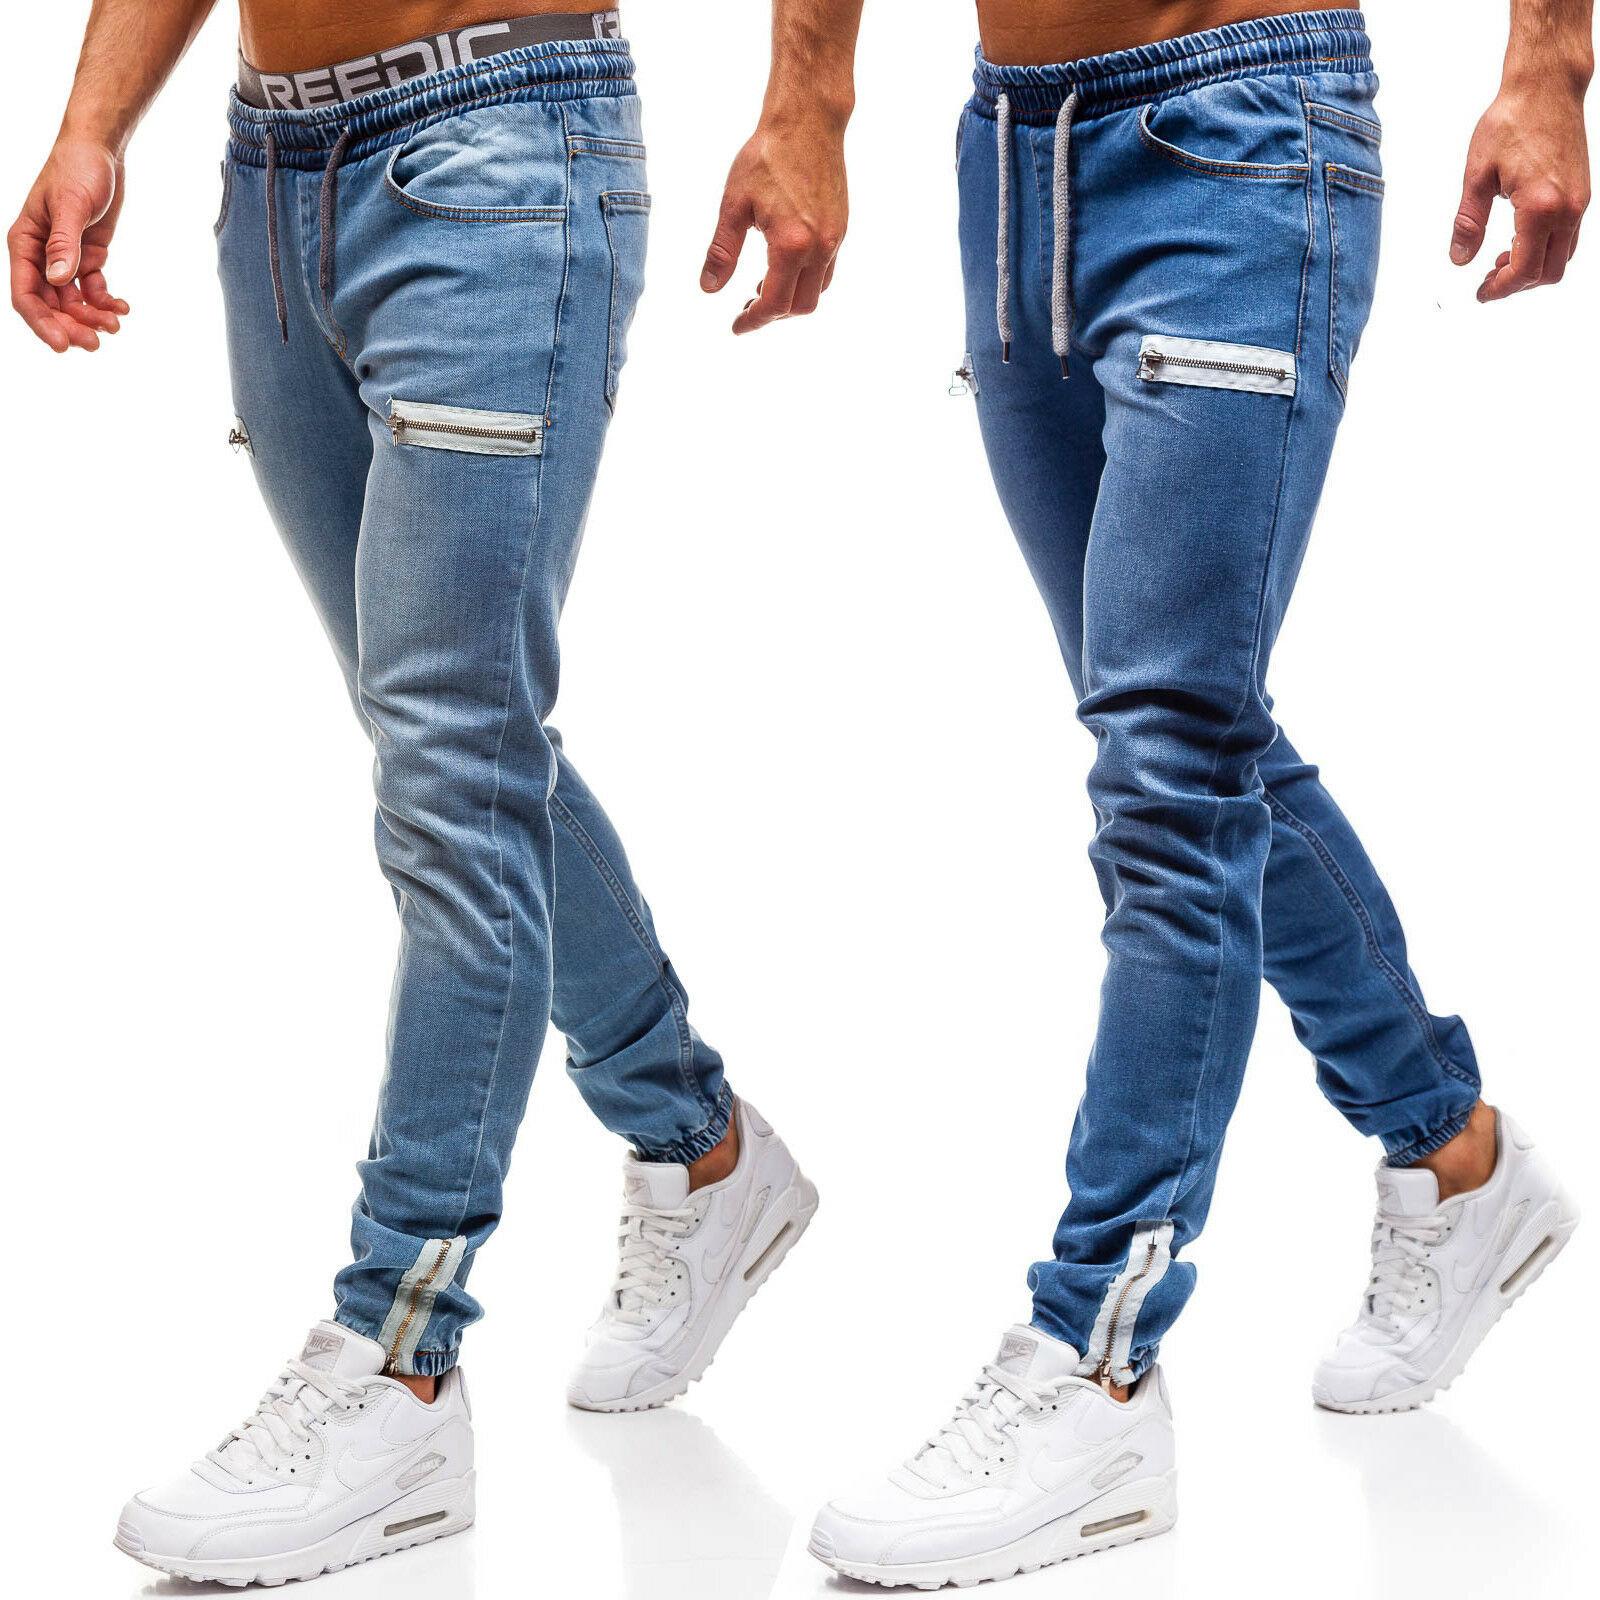 2019 Hot Selling Europe And America Men Jean Fabric Casual Dull Polish Zipper Design Sports Jeans Men's